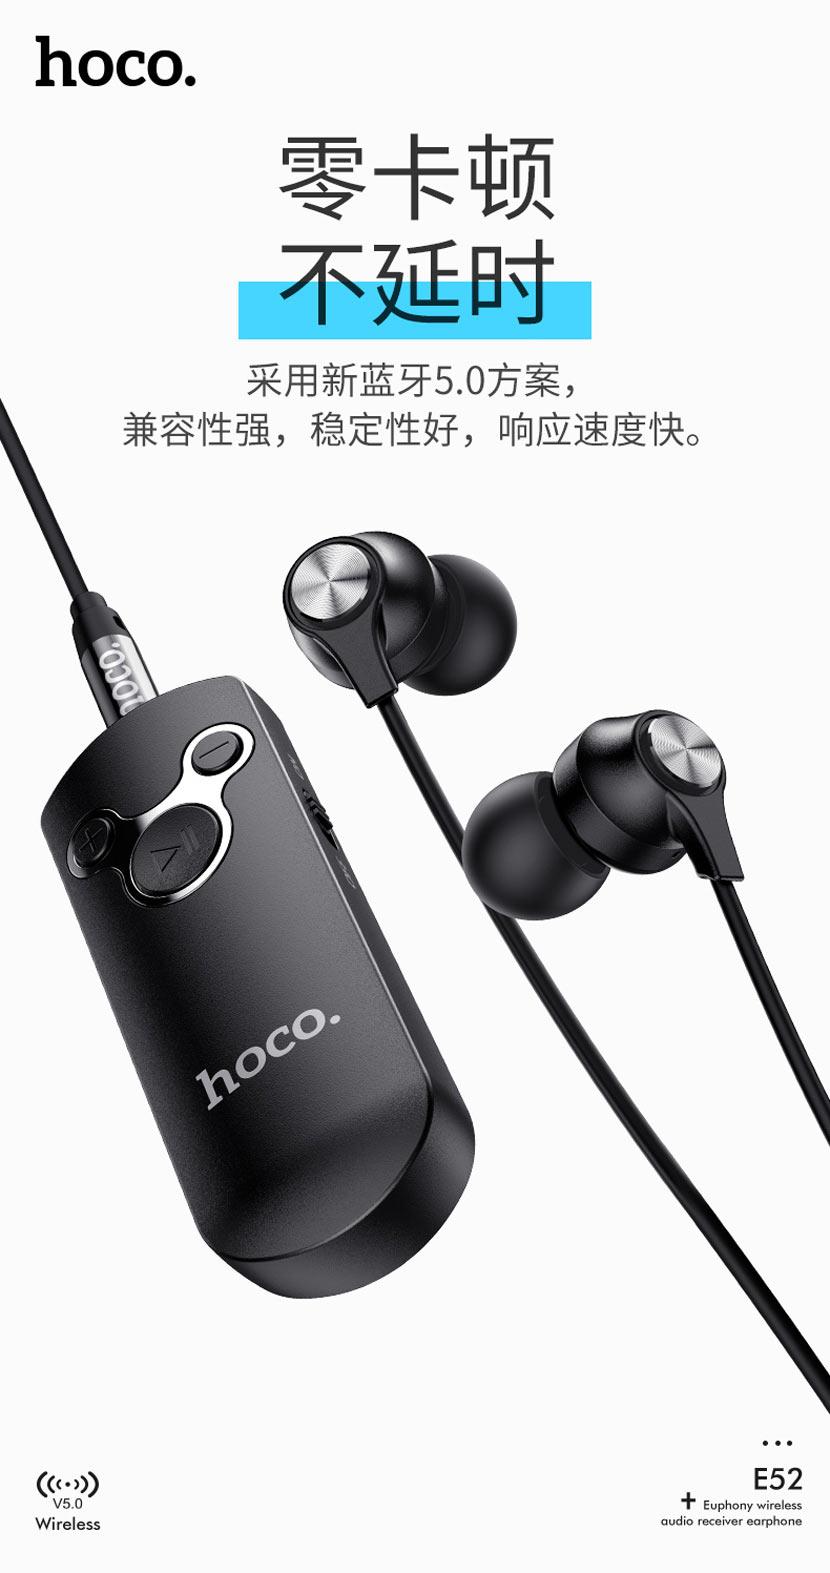 hoco news e52 euphony wireless audio receiver earphones no delay cn